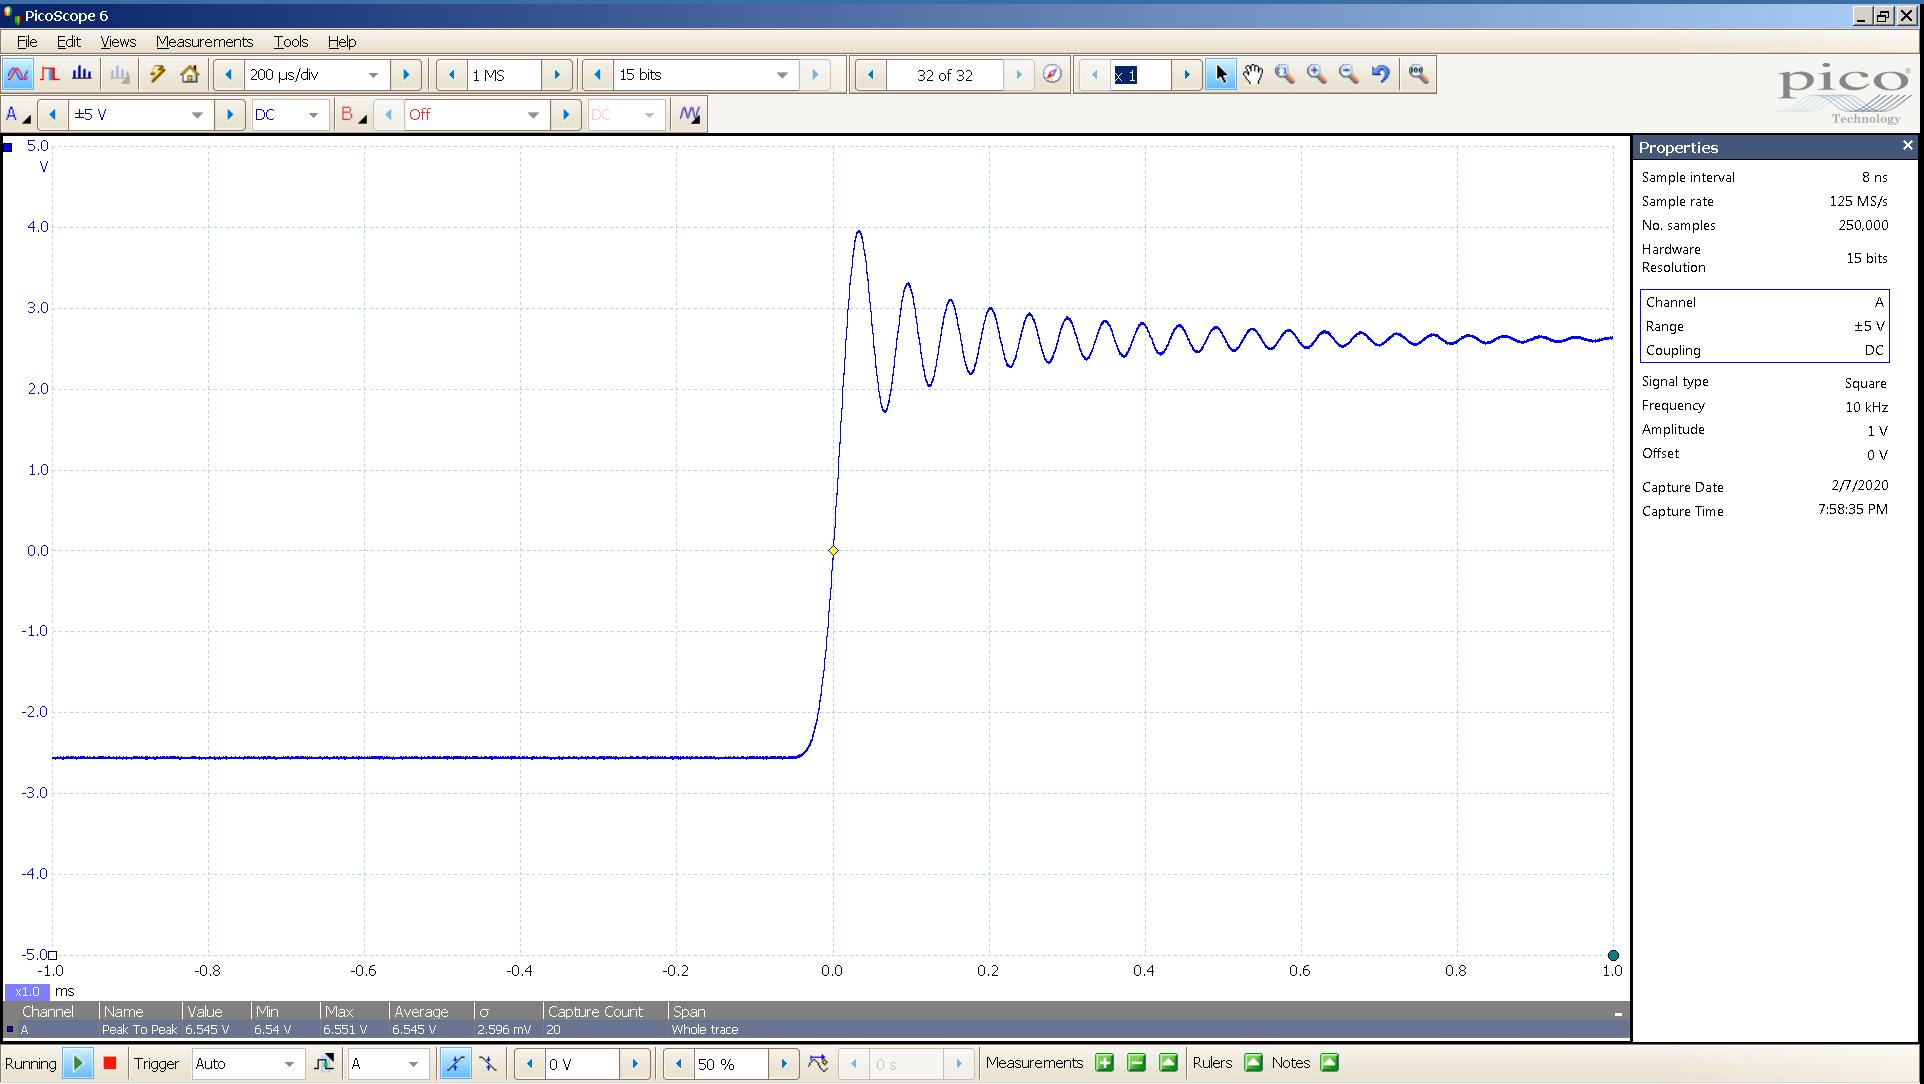 20200207-07 KTE May 20 Hz sqr -4 dBFS 5 Vpp 200uS div SE - ASIO - OS PCM.png